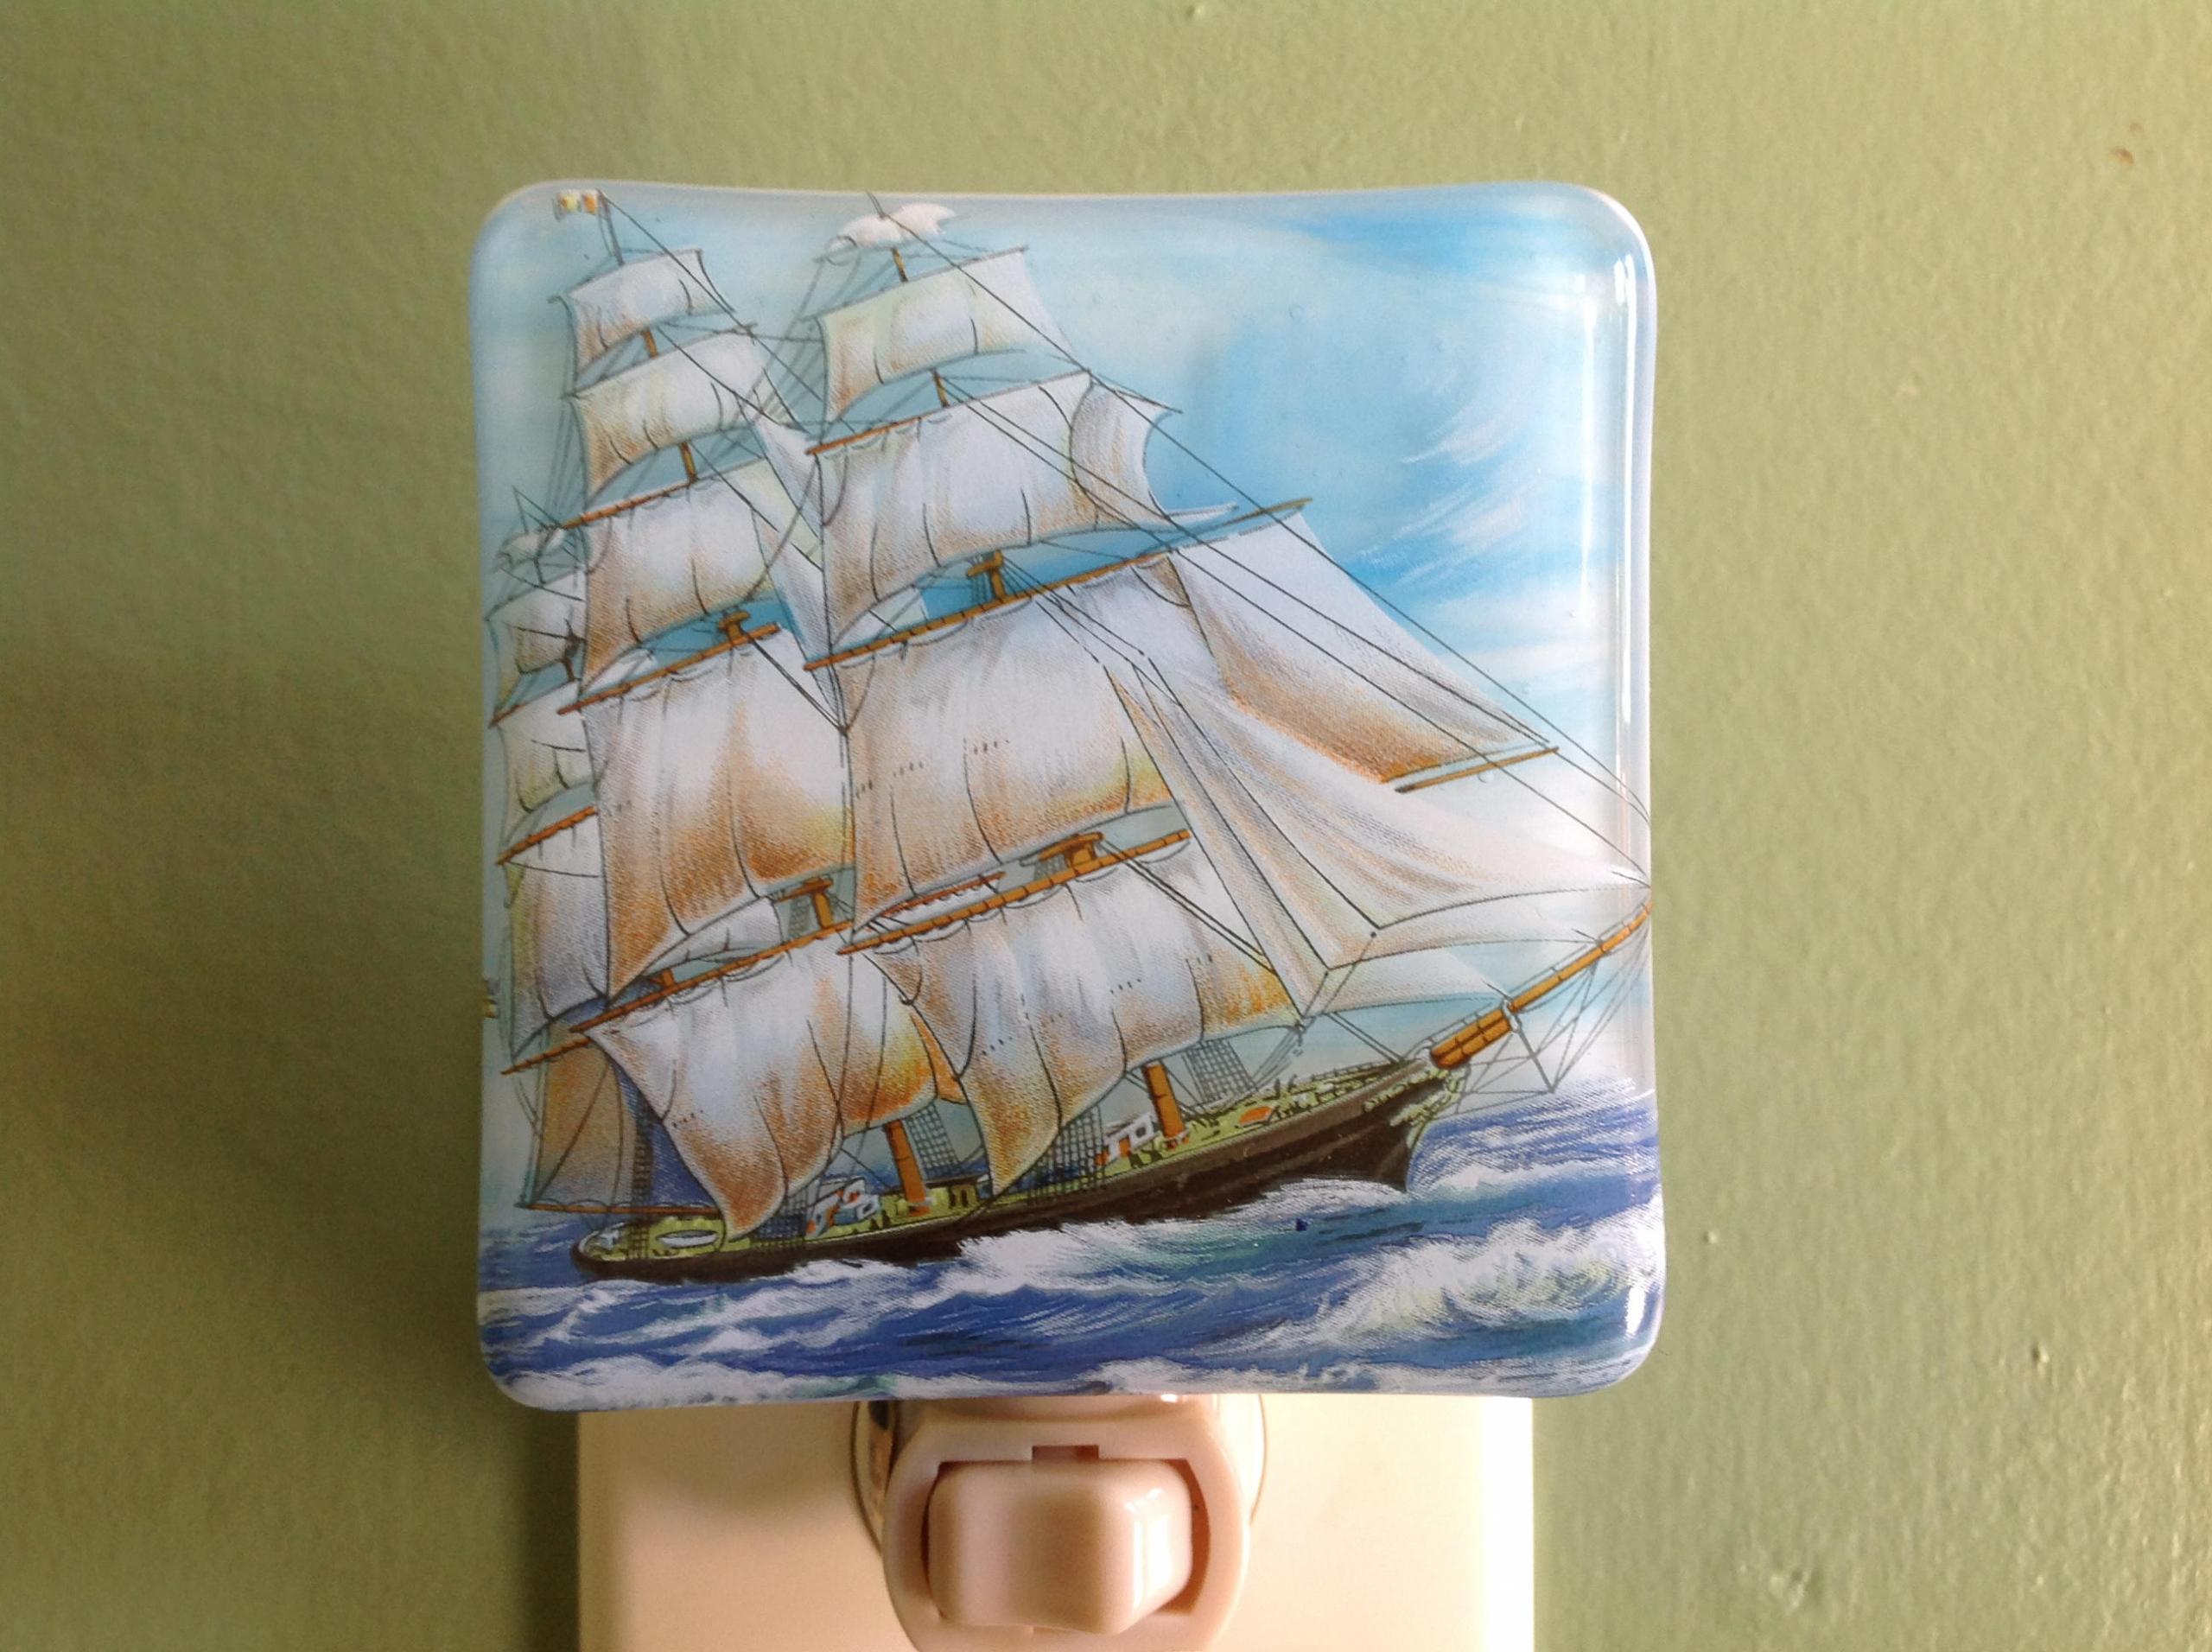 Tall Ship Fused Glass Night Light Pirate Ship Nightlight Schooner Nautical Sailing Vessel Topsail Schooners Brigantines Schooner Chandlery